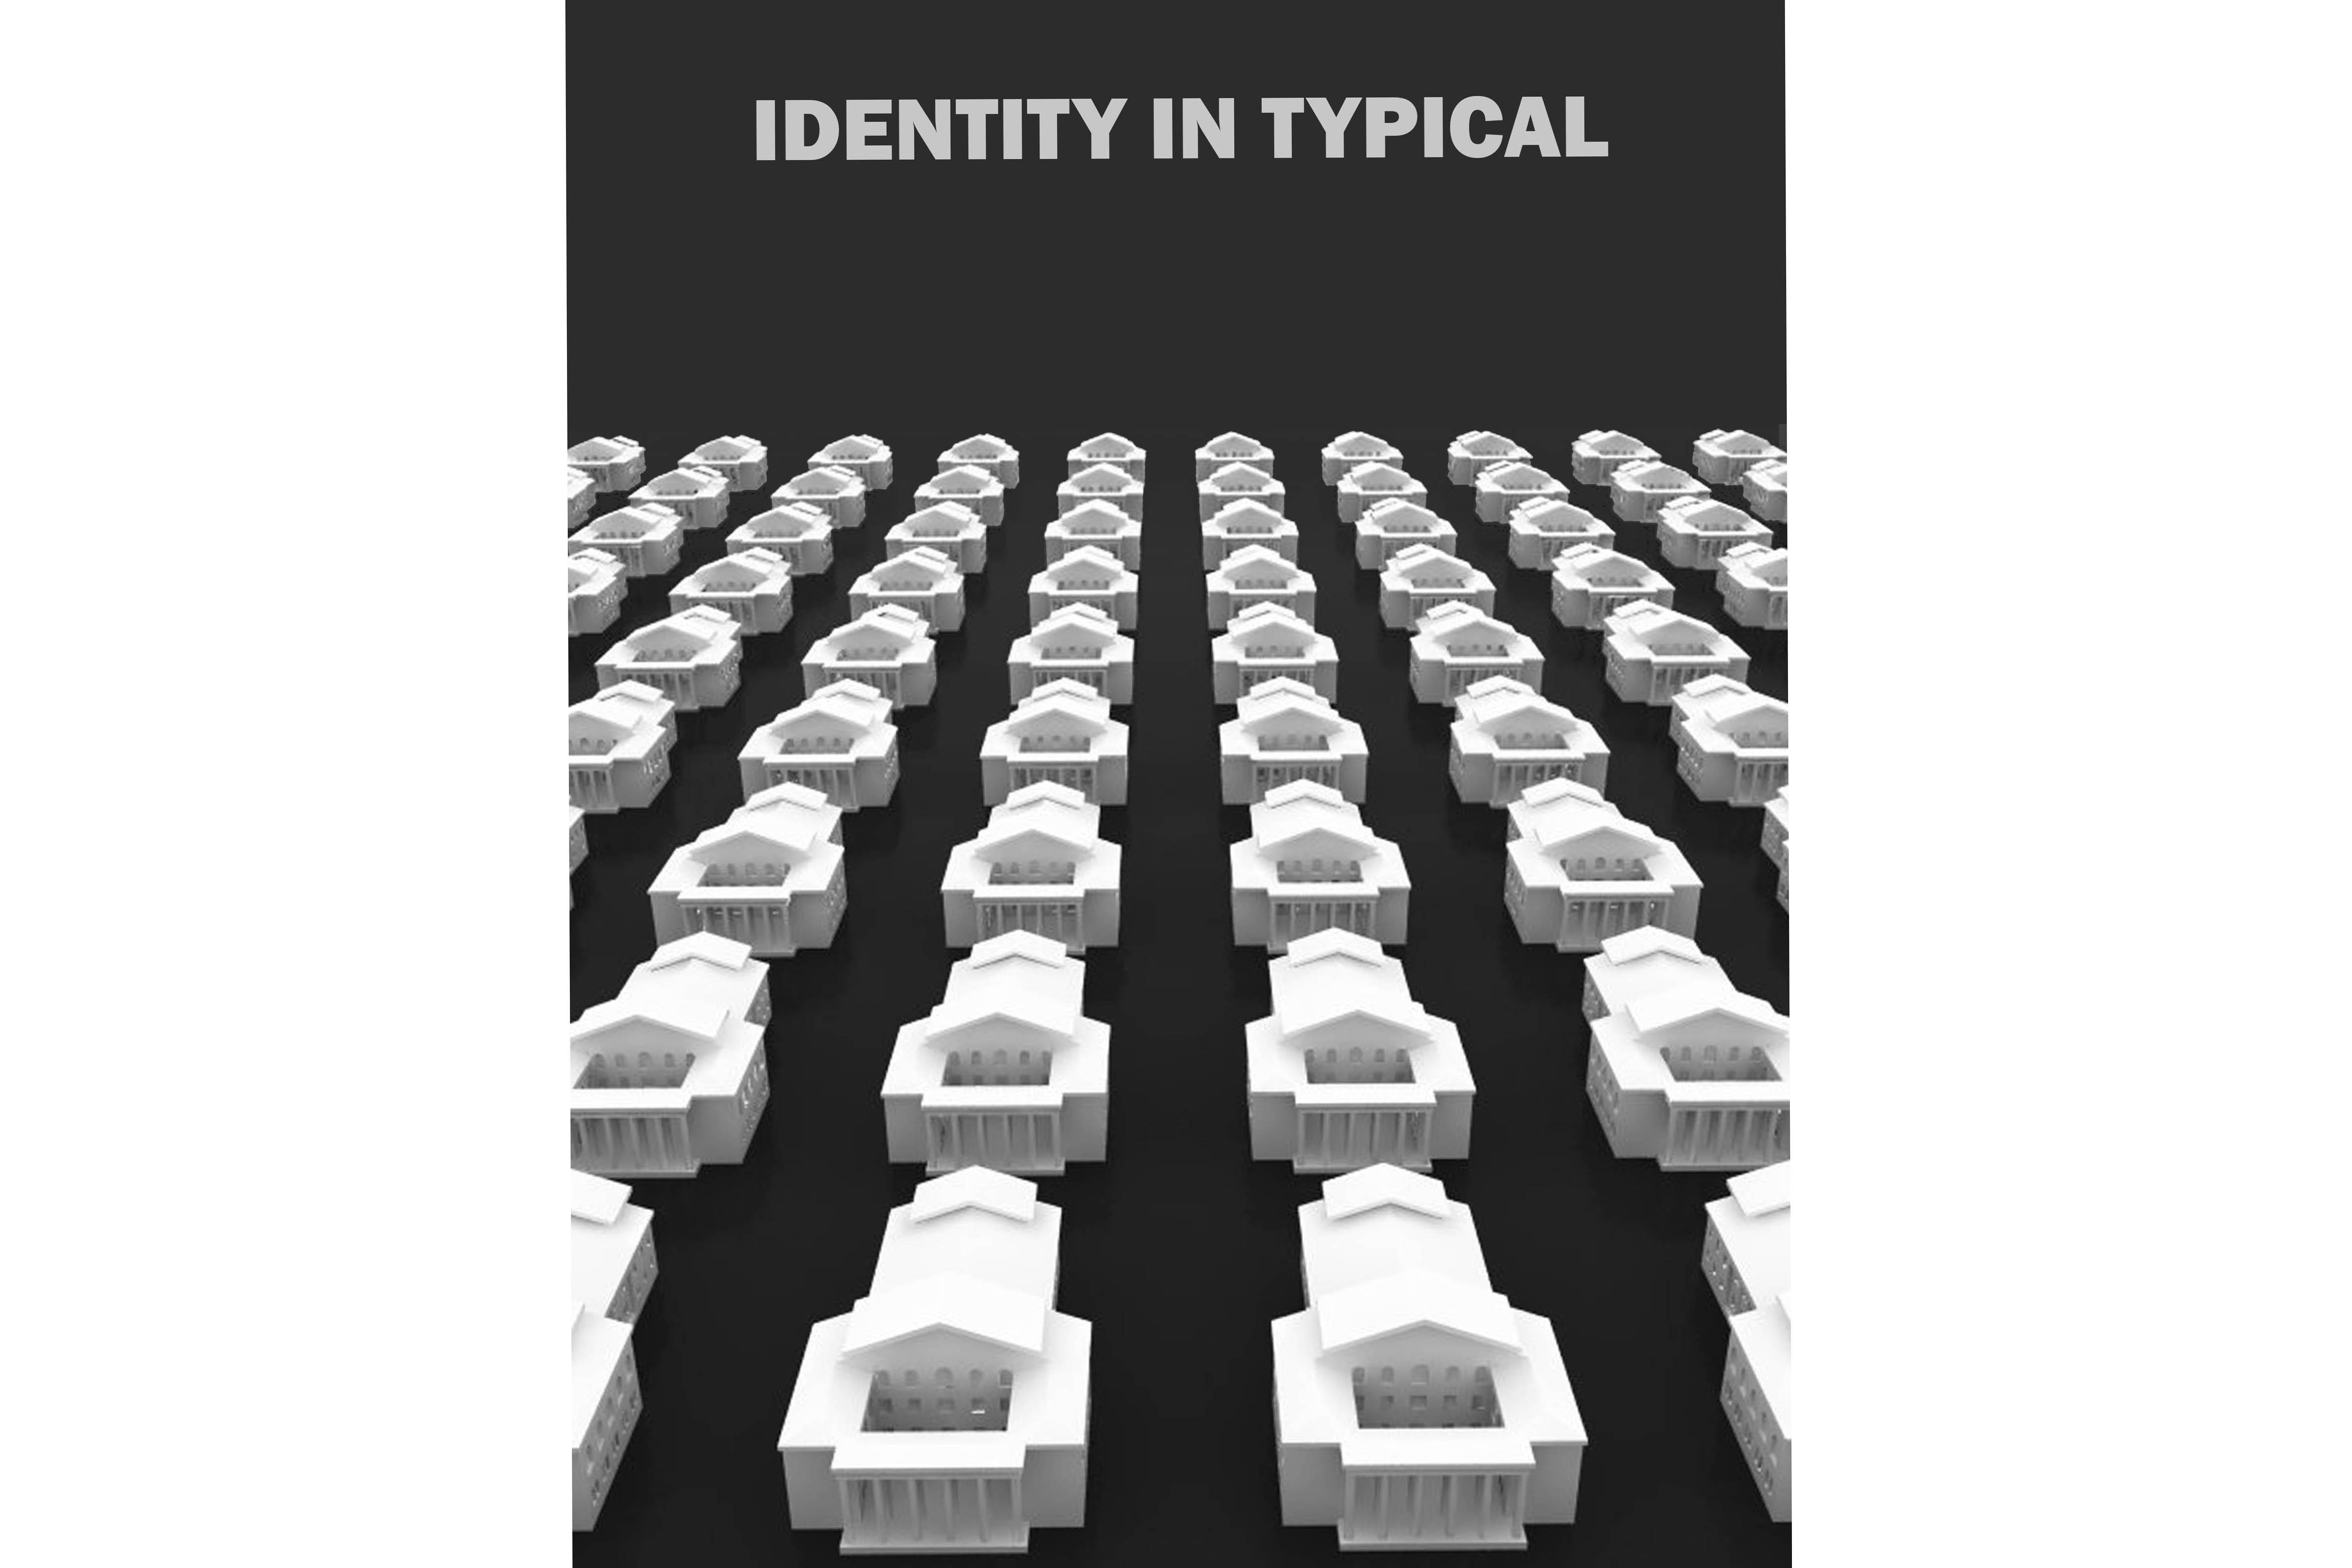 identityintypicalweb.jpg